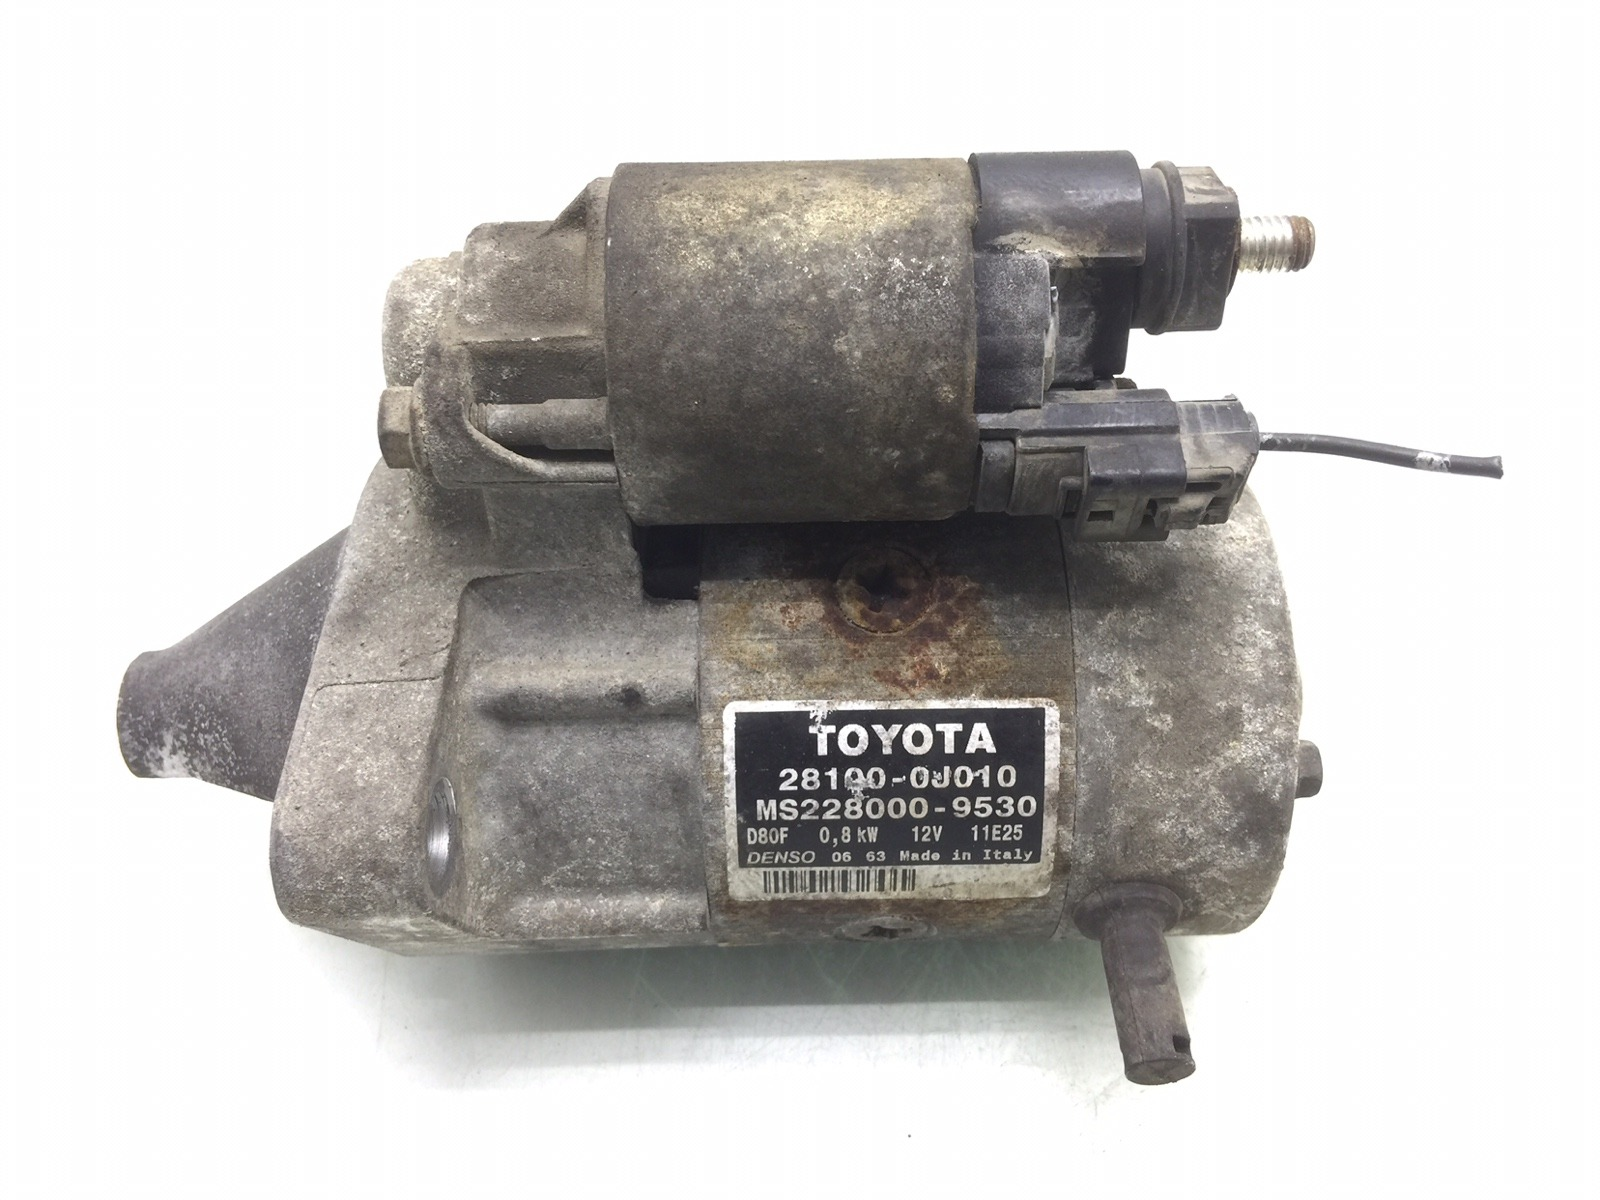 Стартер Toyota Yaris P1 1.0 I 2004 (б/у)